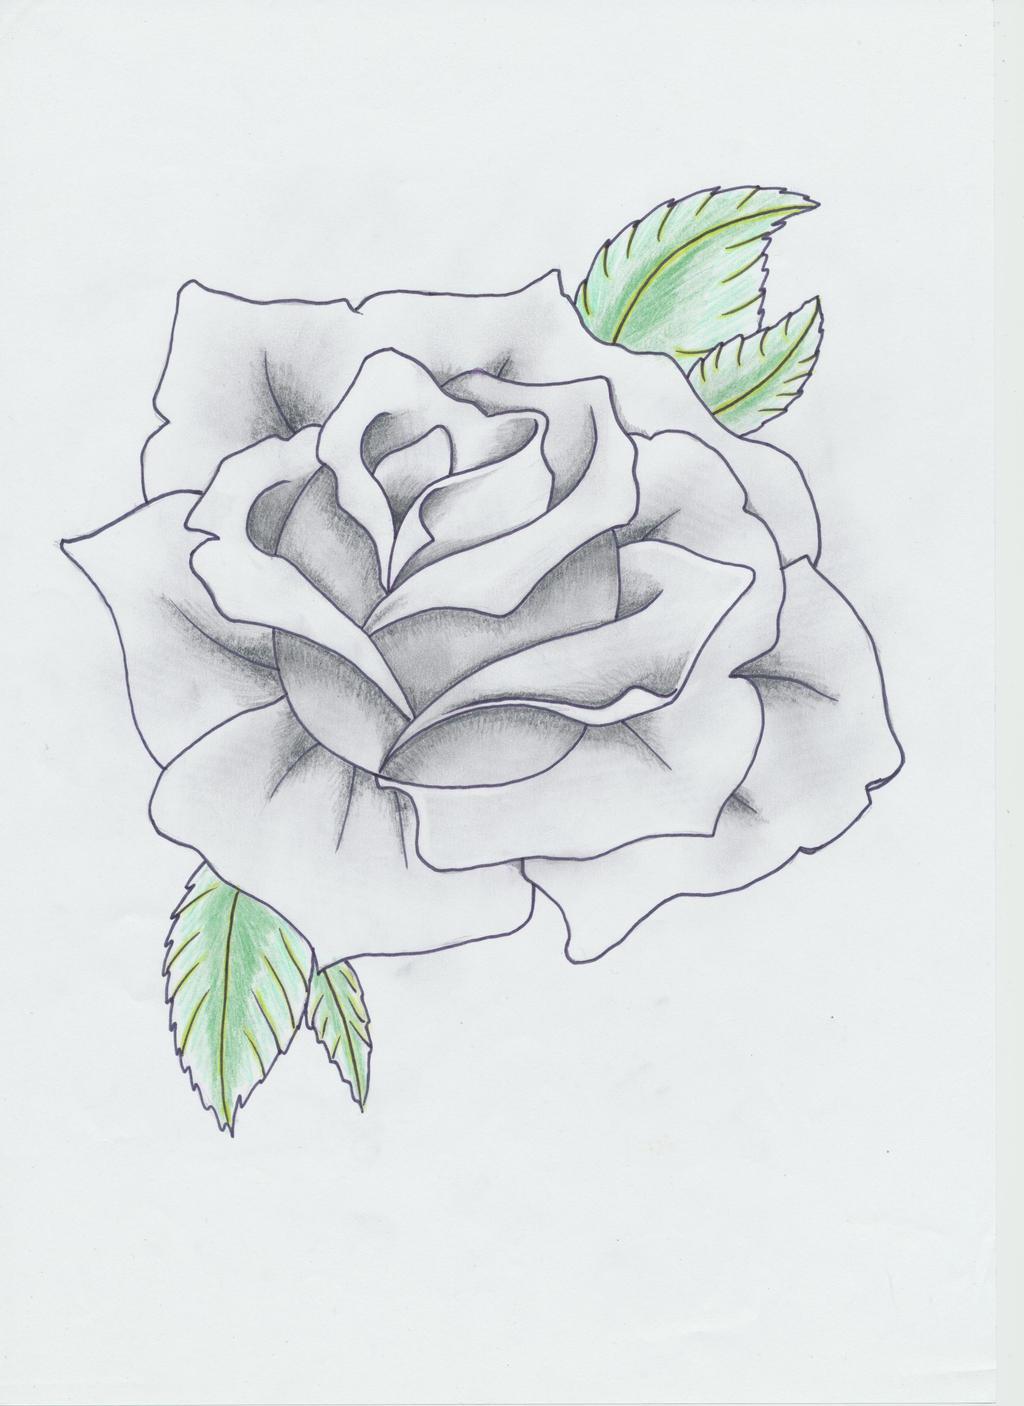 black and gray rose tattoo by helldemondavey on deviantart. Black Bedroom Furniture Sets. Home Design Ideas